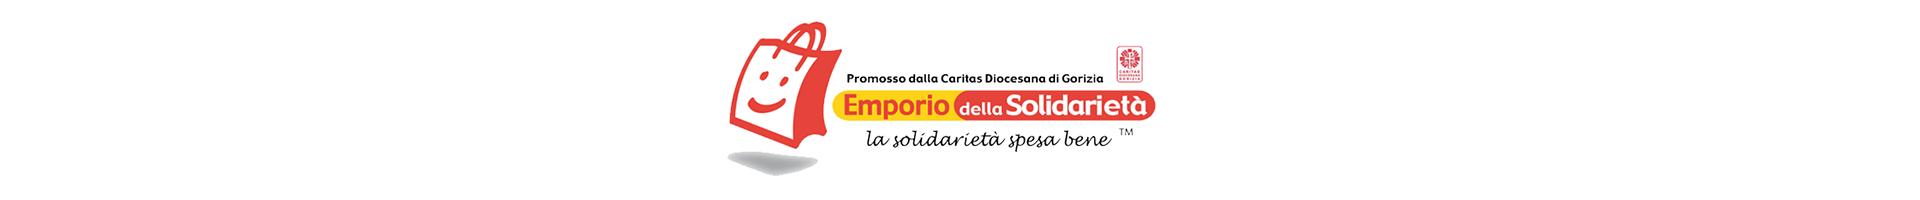 logo desktop